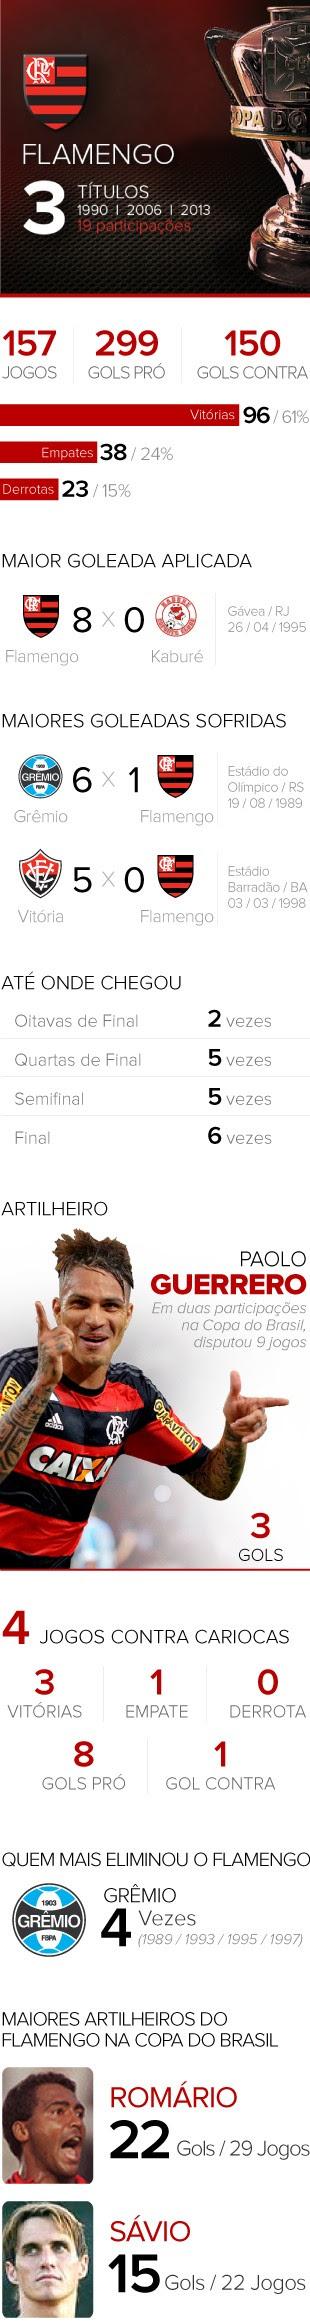 INFO - Copa do Brasil Flamengo (Foto: Editoria de Arte)